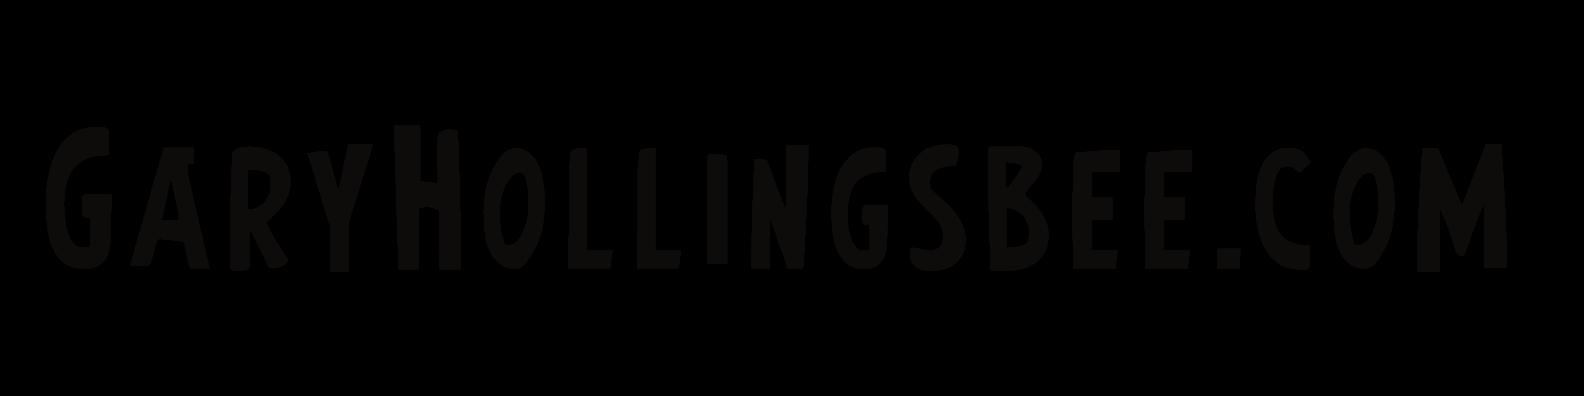 GaryHollingsbee.com - Gary Hollingsbee's Web.